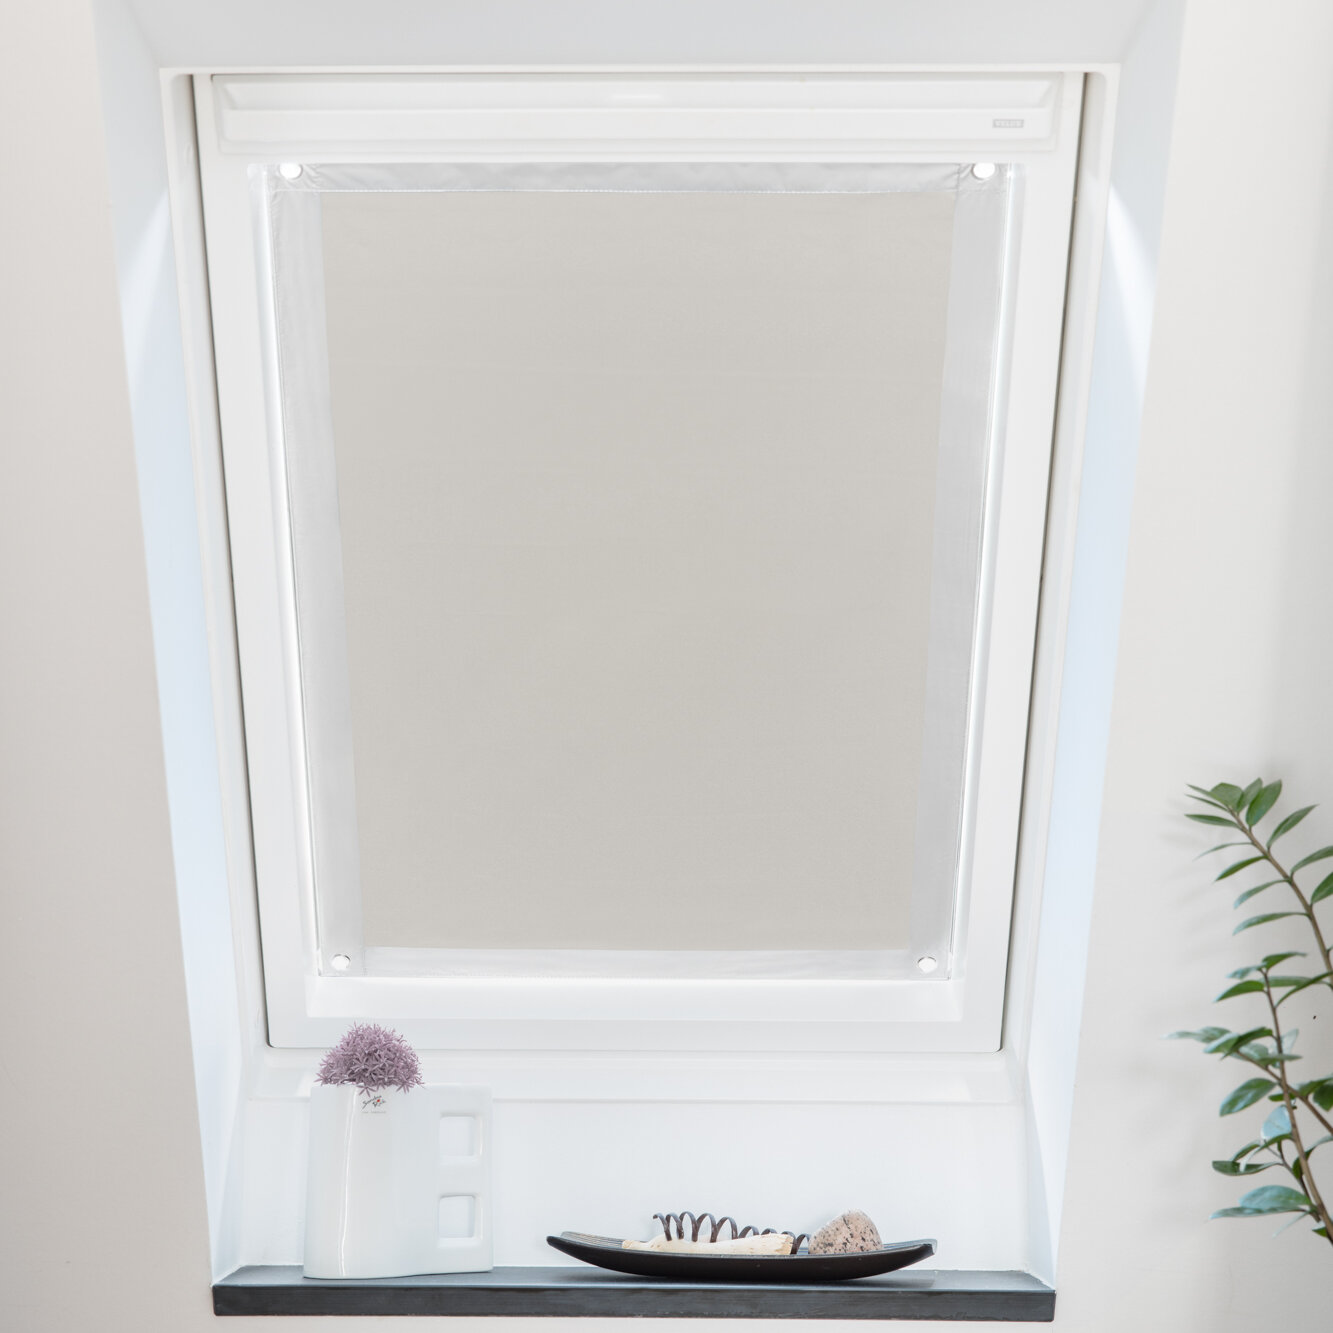 lichtblick dachfenster sonnenschutz haftfix | wayfair.de